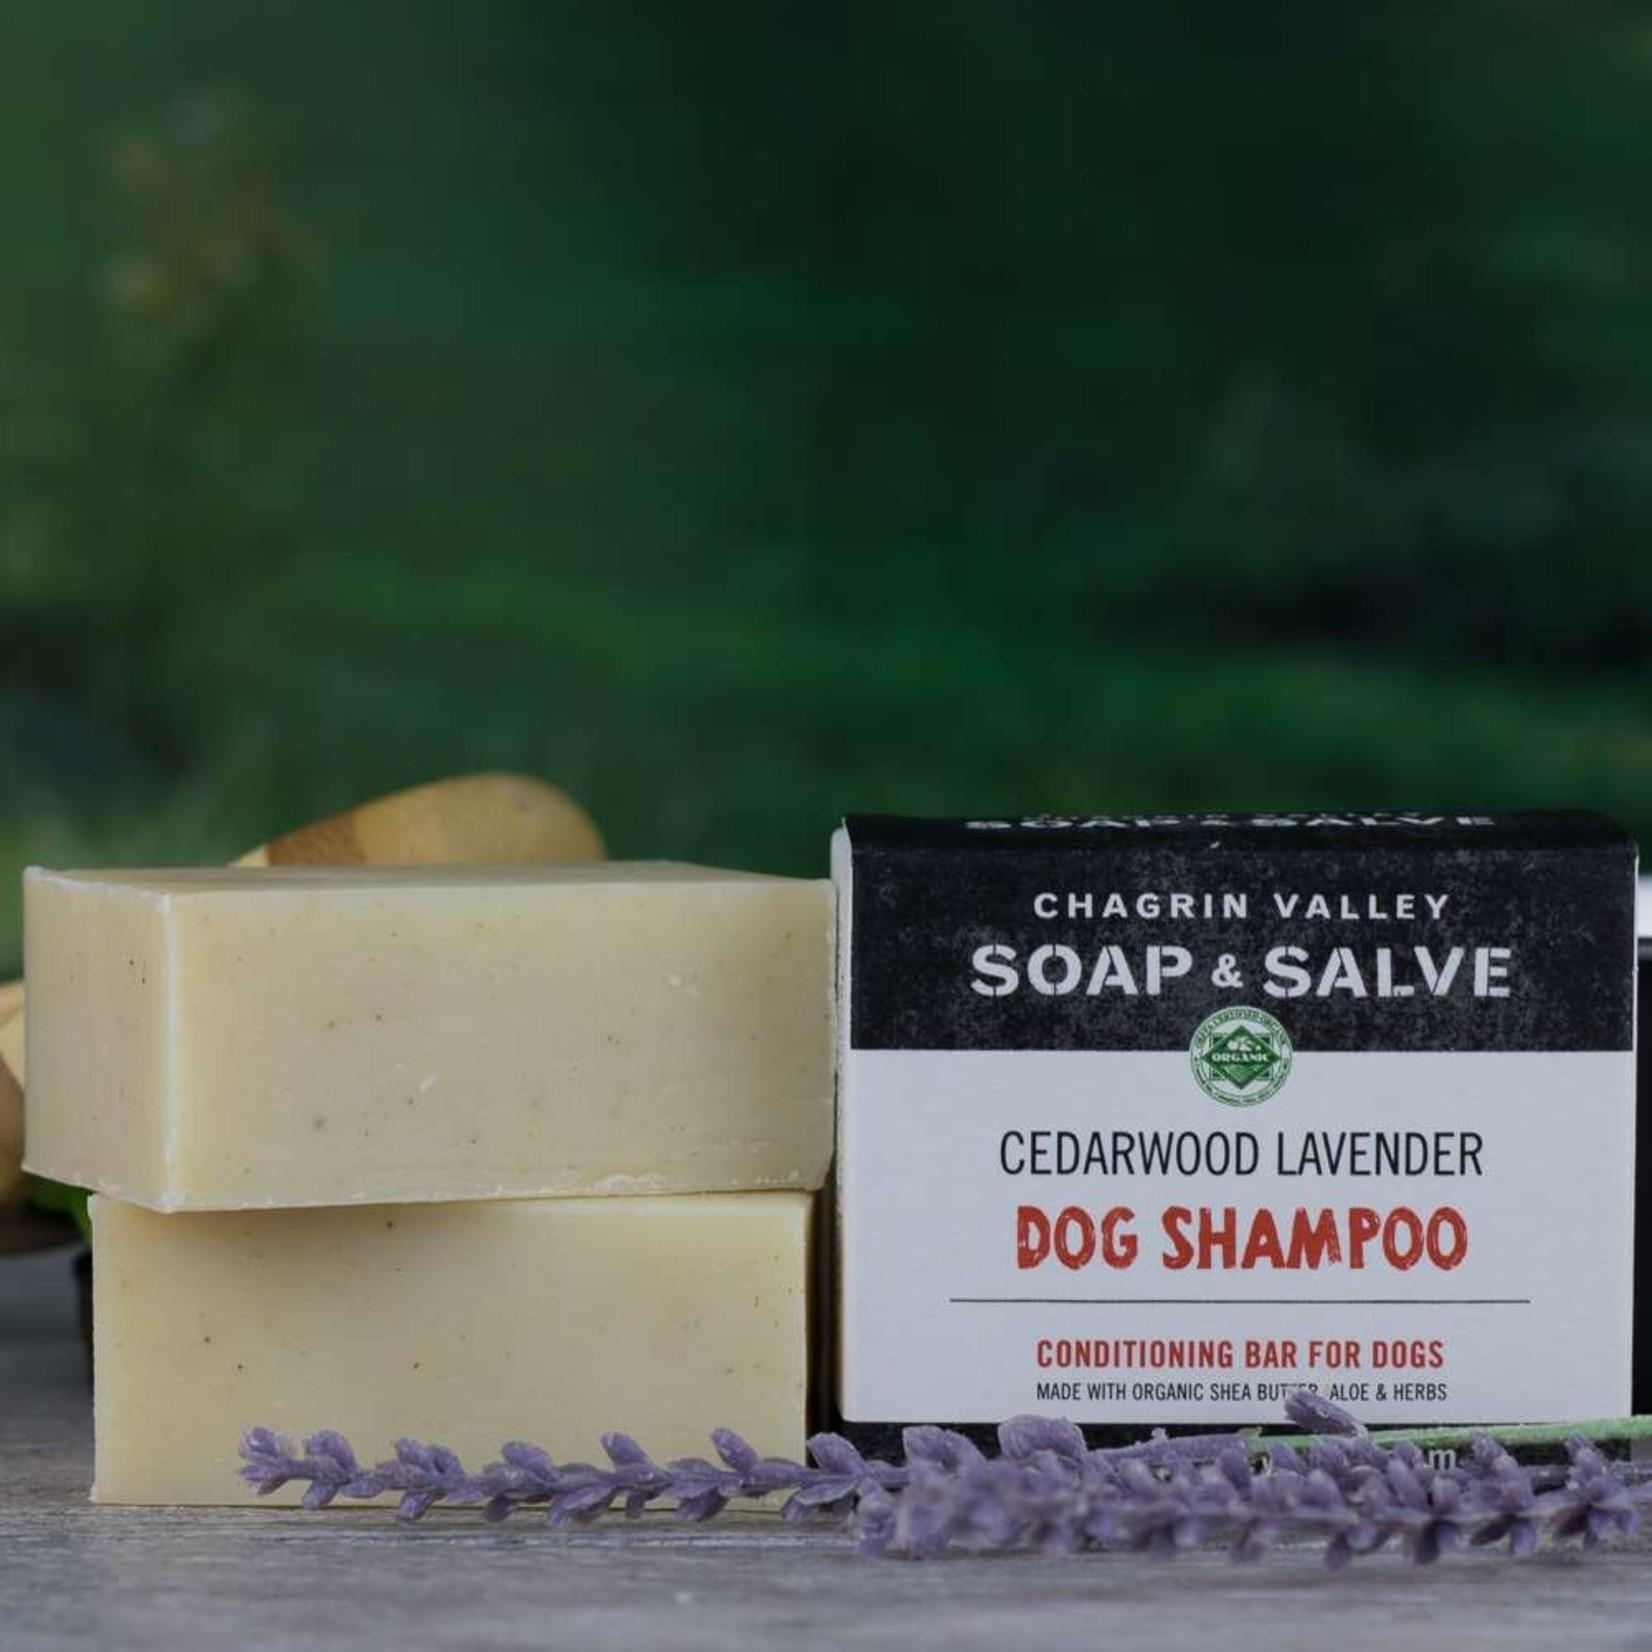 Chagrin Valley Soap and Salve Cedarwood lavender Dog Shampoo Bar